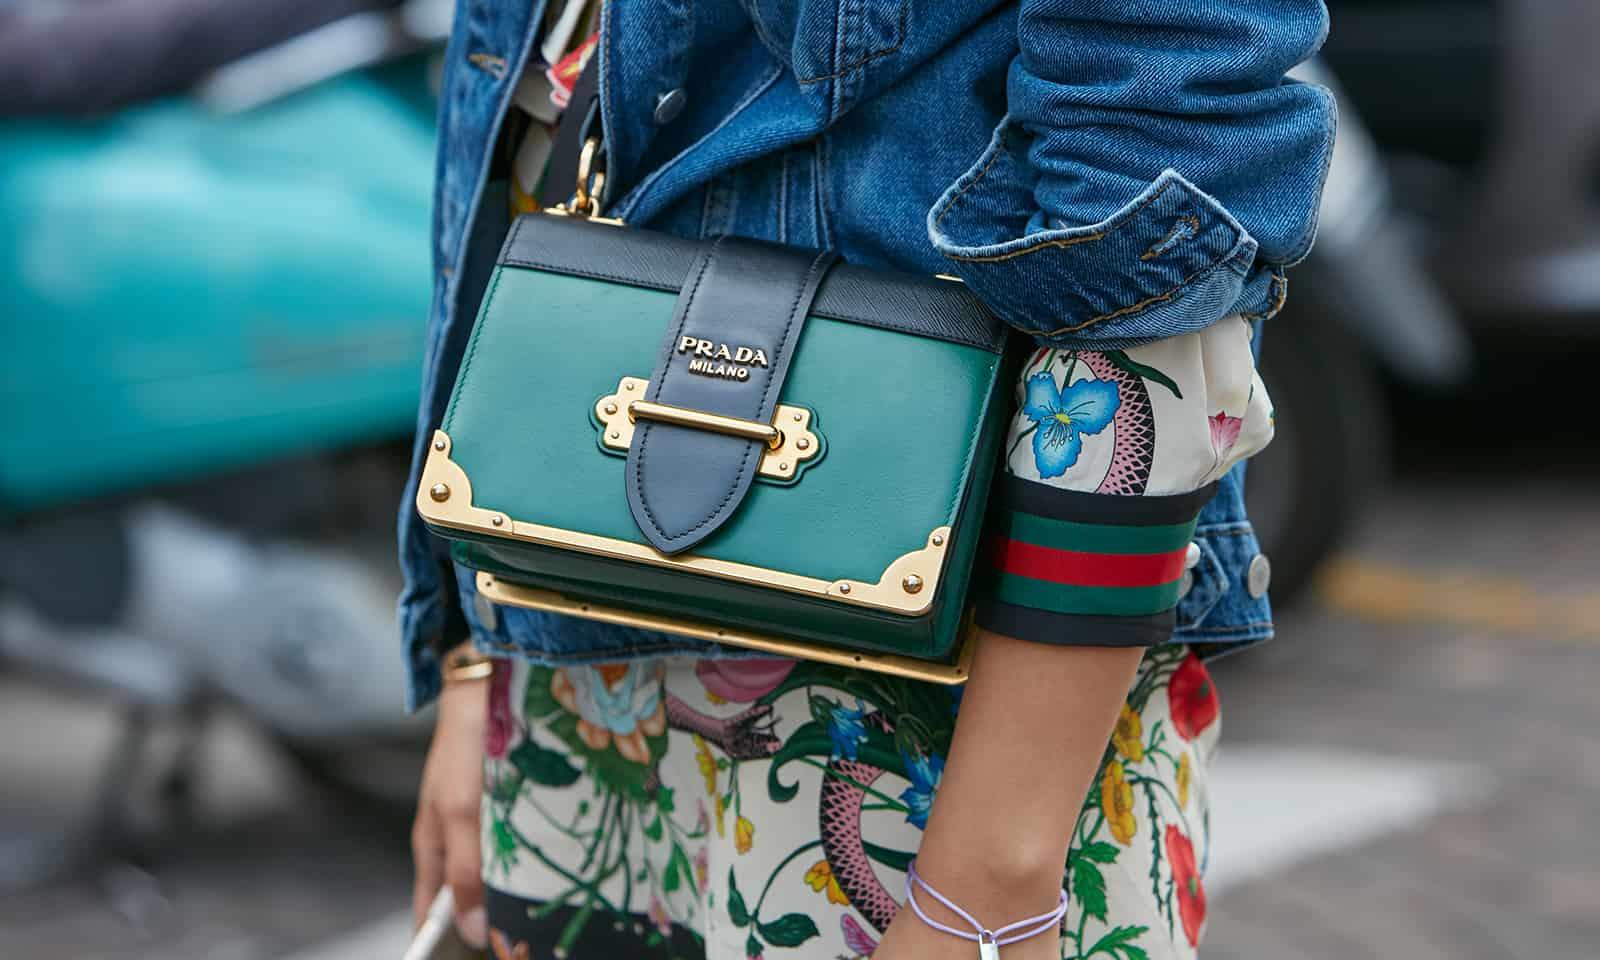 Is-your-designer-bag-a-fake-main-image-viva-glam-magazine-prada-bag